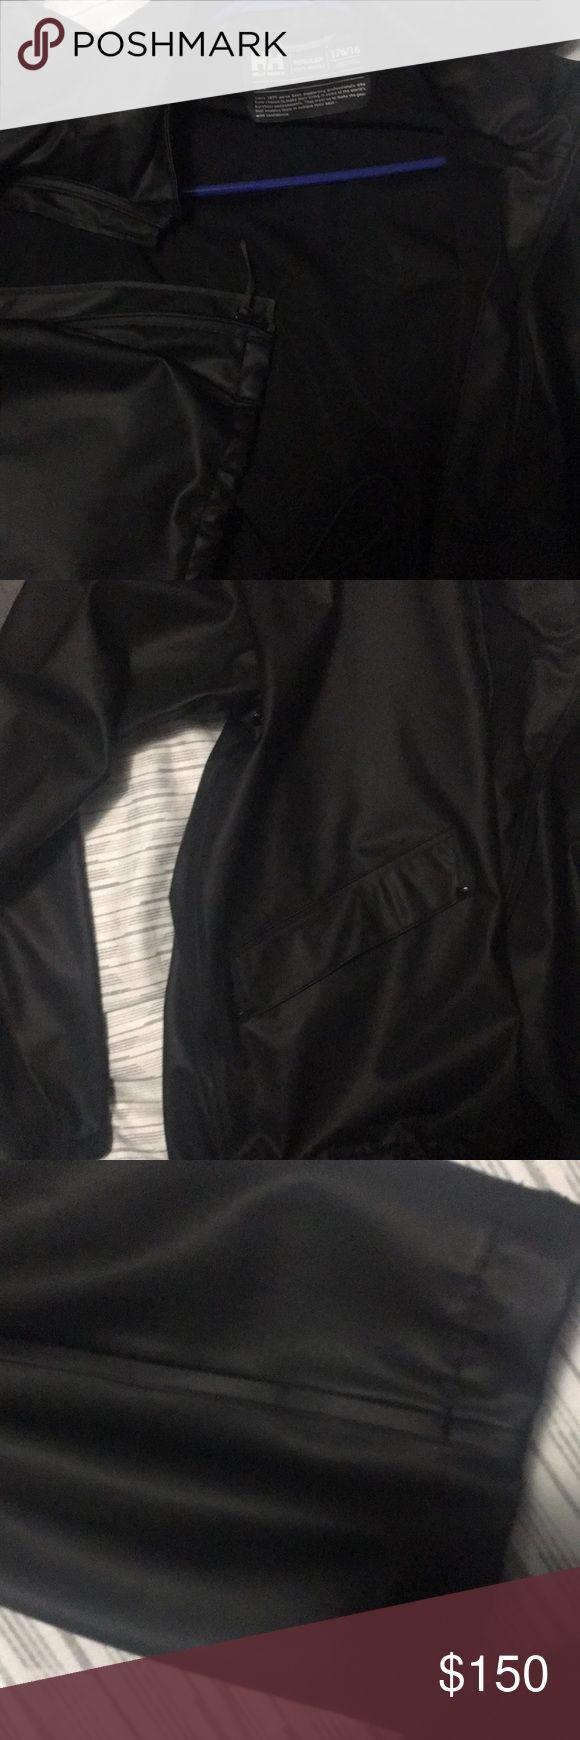 Helly Hansen Black n silver writing Helly Hansen Jackets & Coats Raincoats